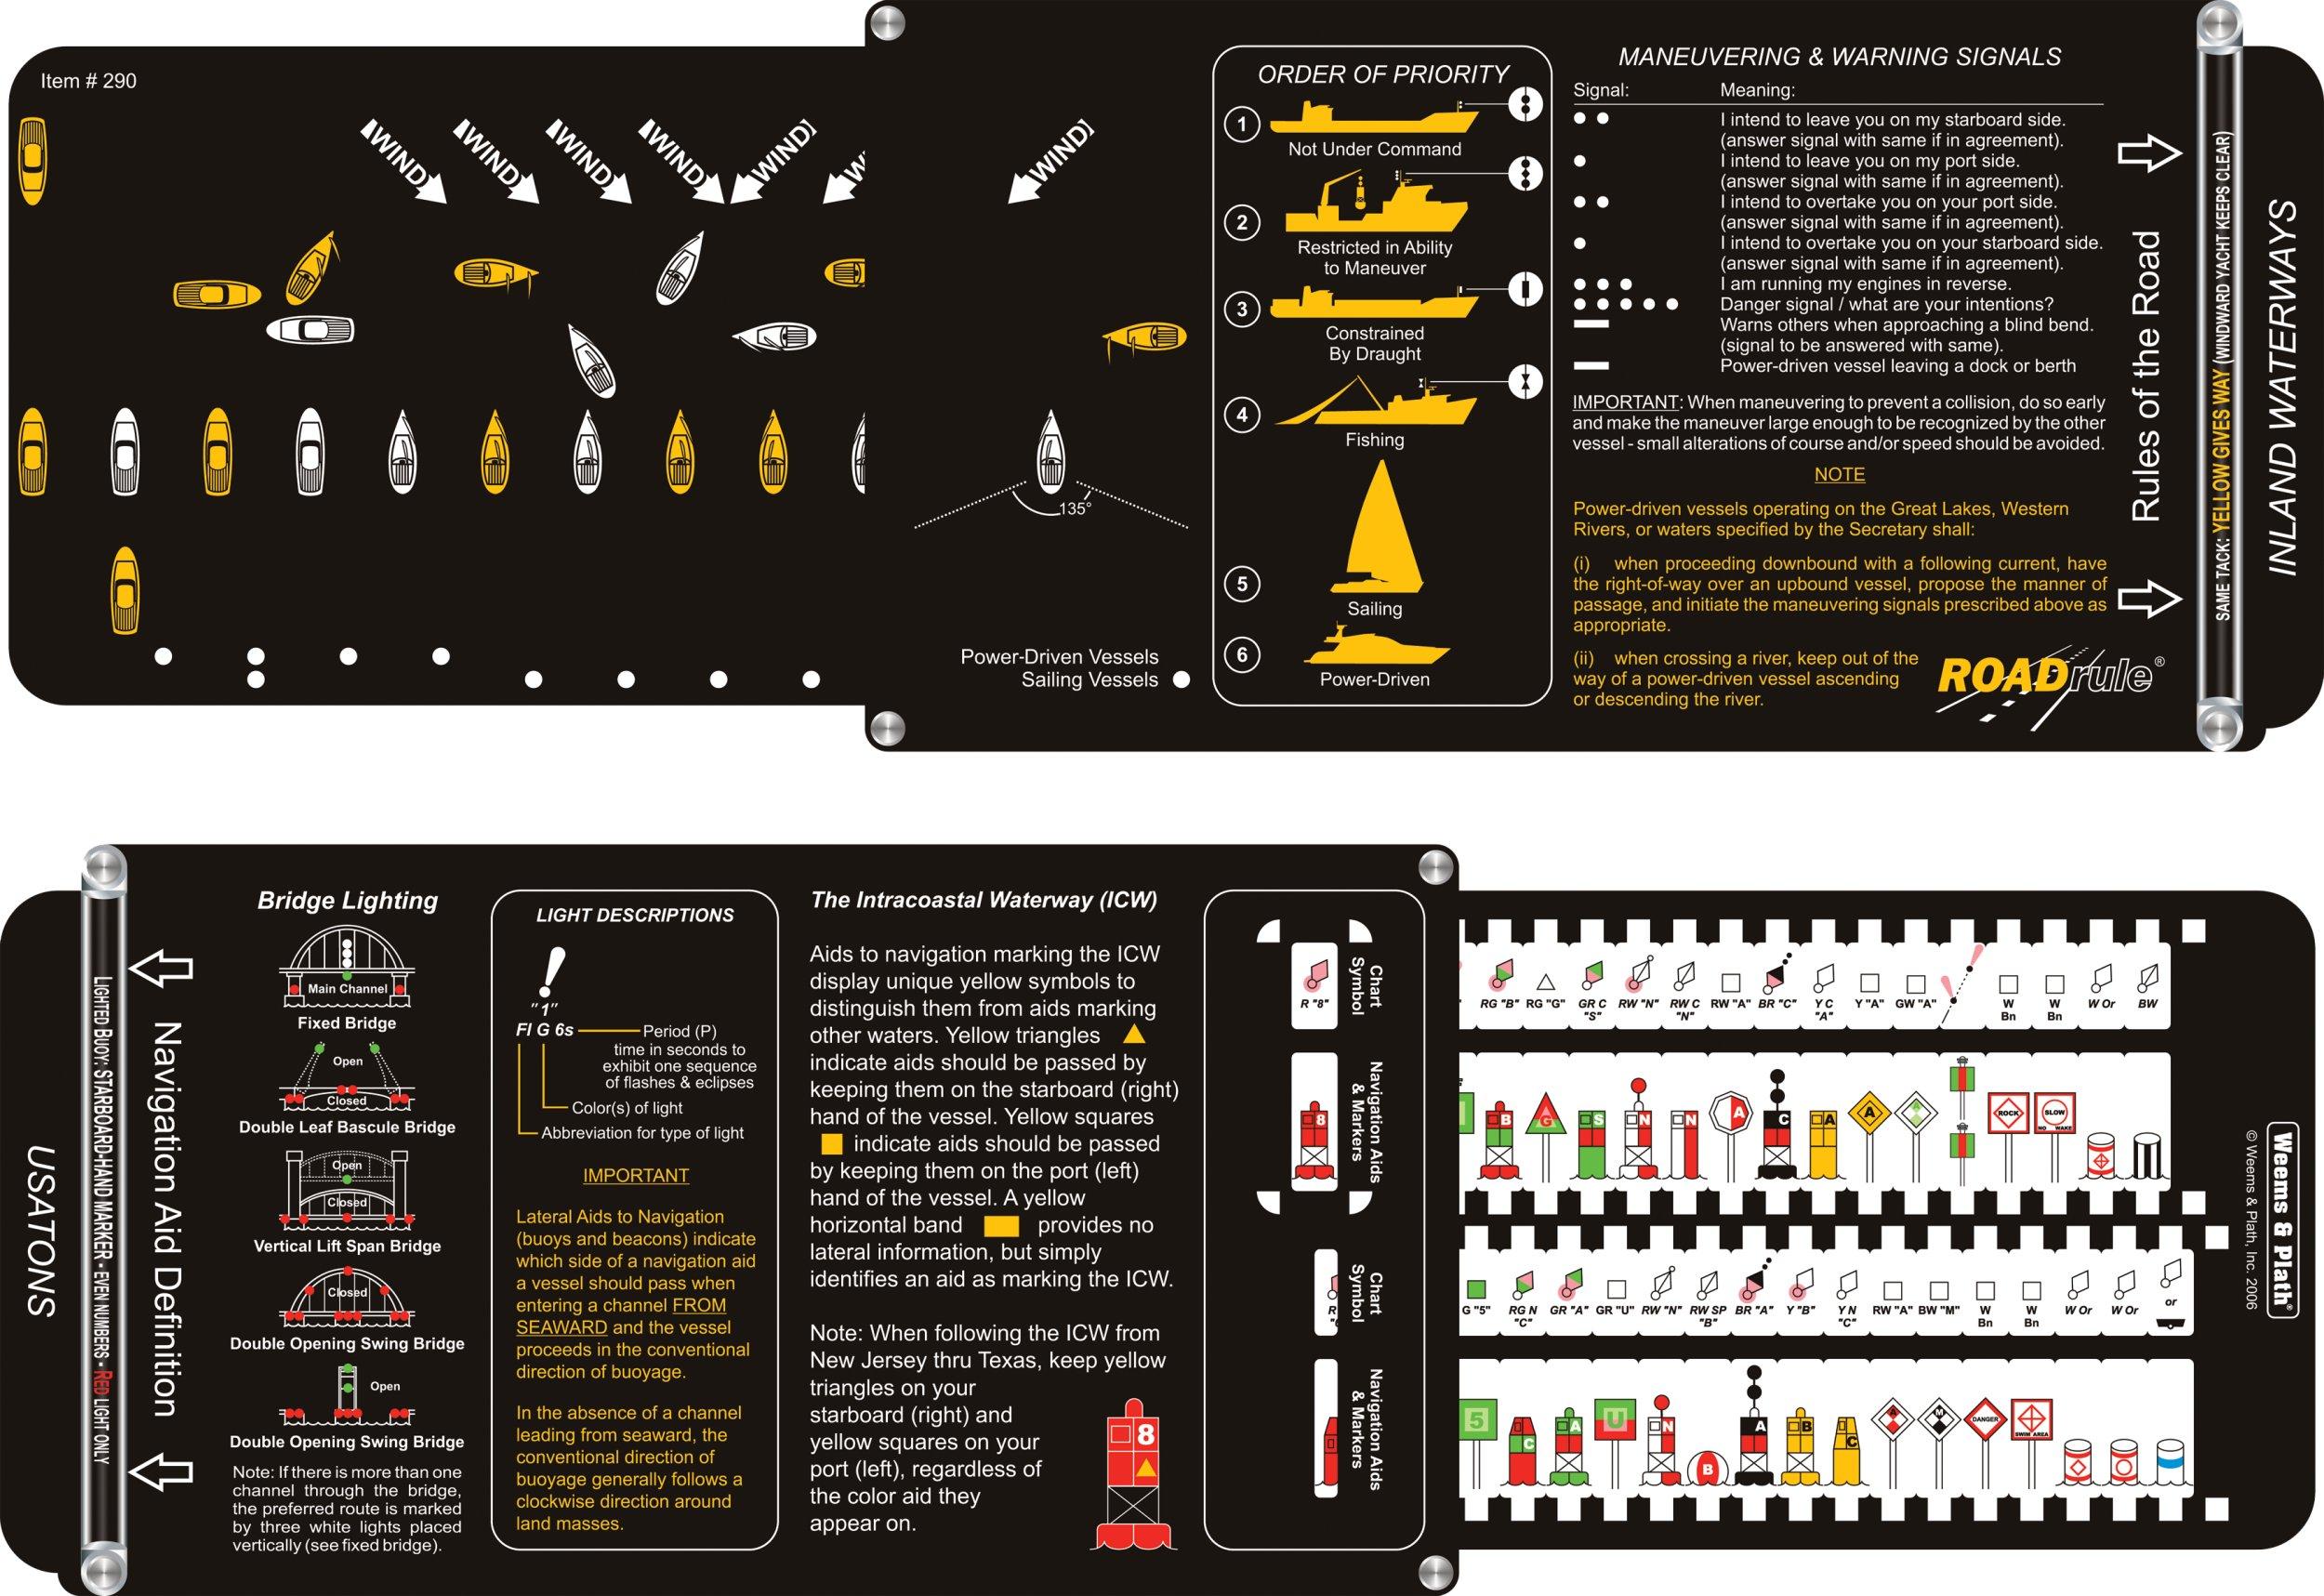 Weems & Plath Marine Navigation ROADrule Marine Navigation Aids, Rules of the Road and Light Characteristics (USATONS, U.S. Waters)